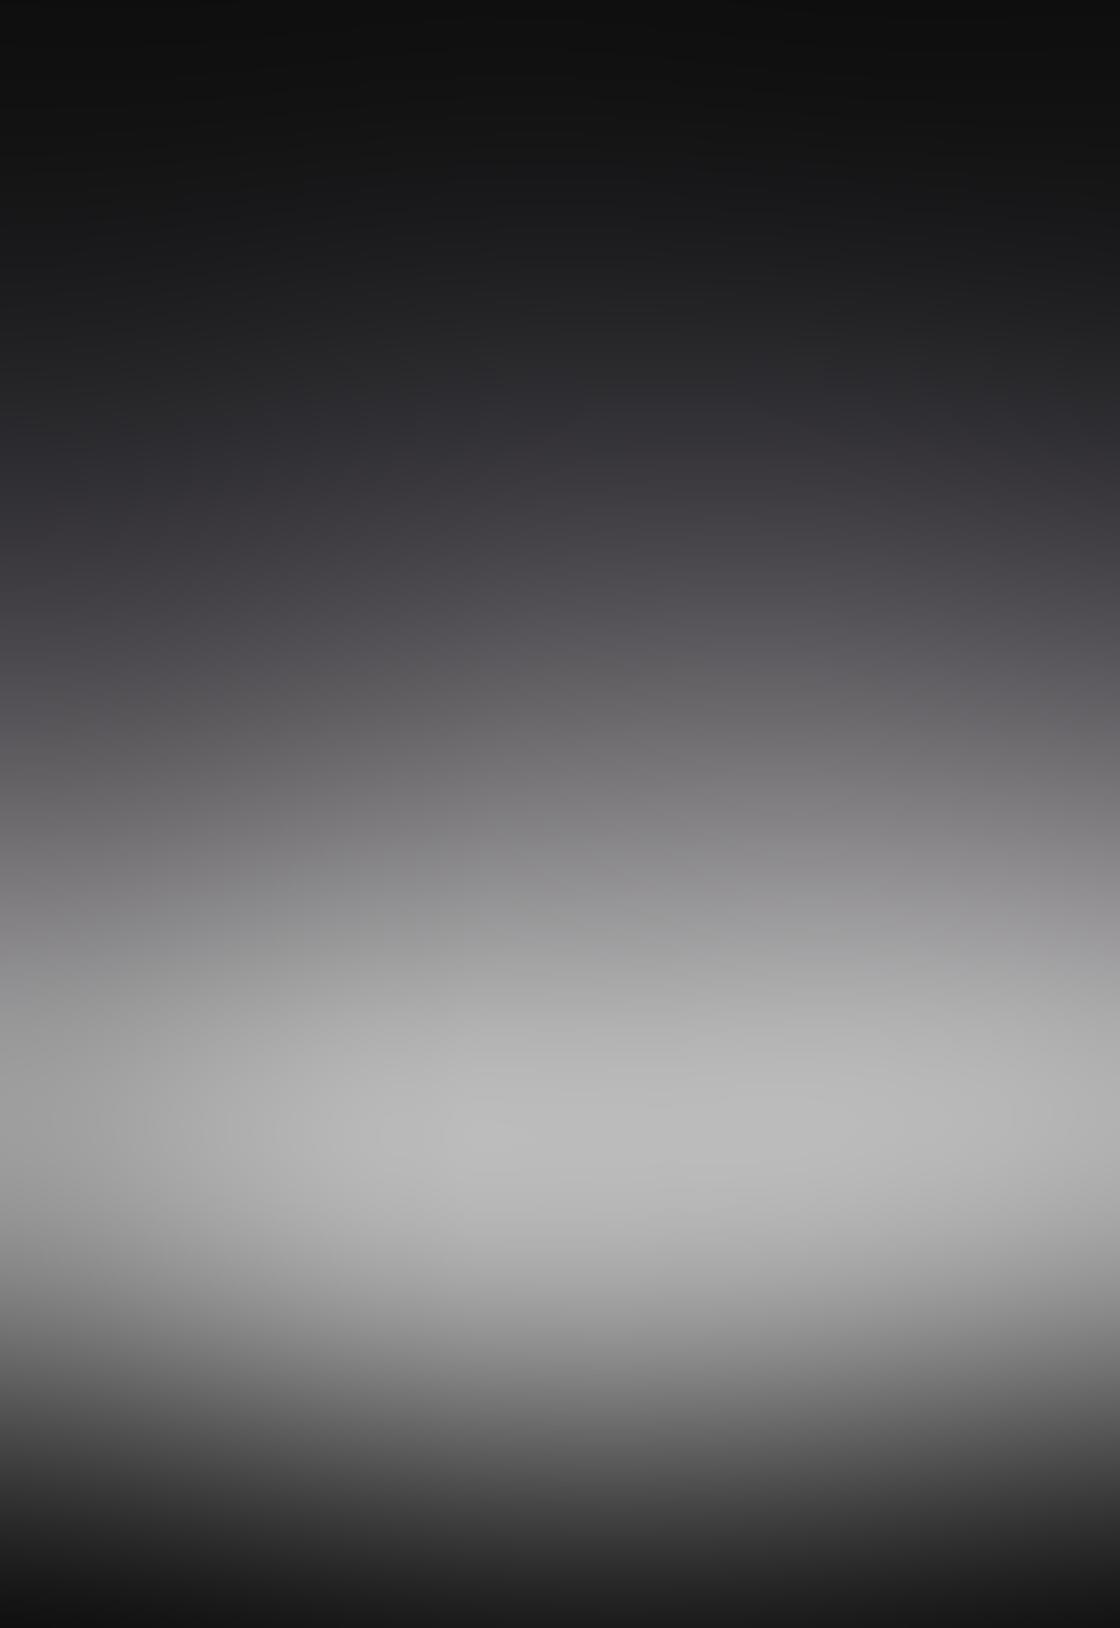 iPhone Photos Black White 13